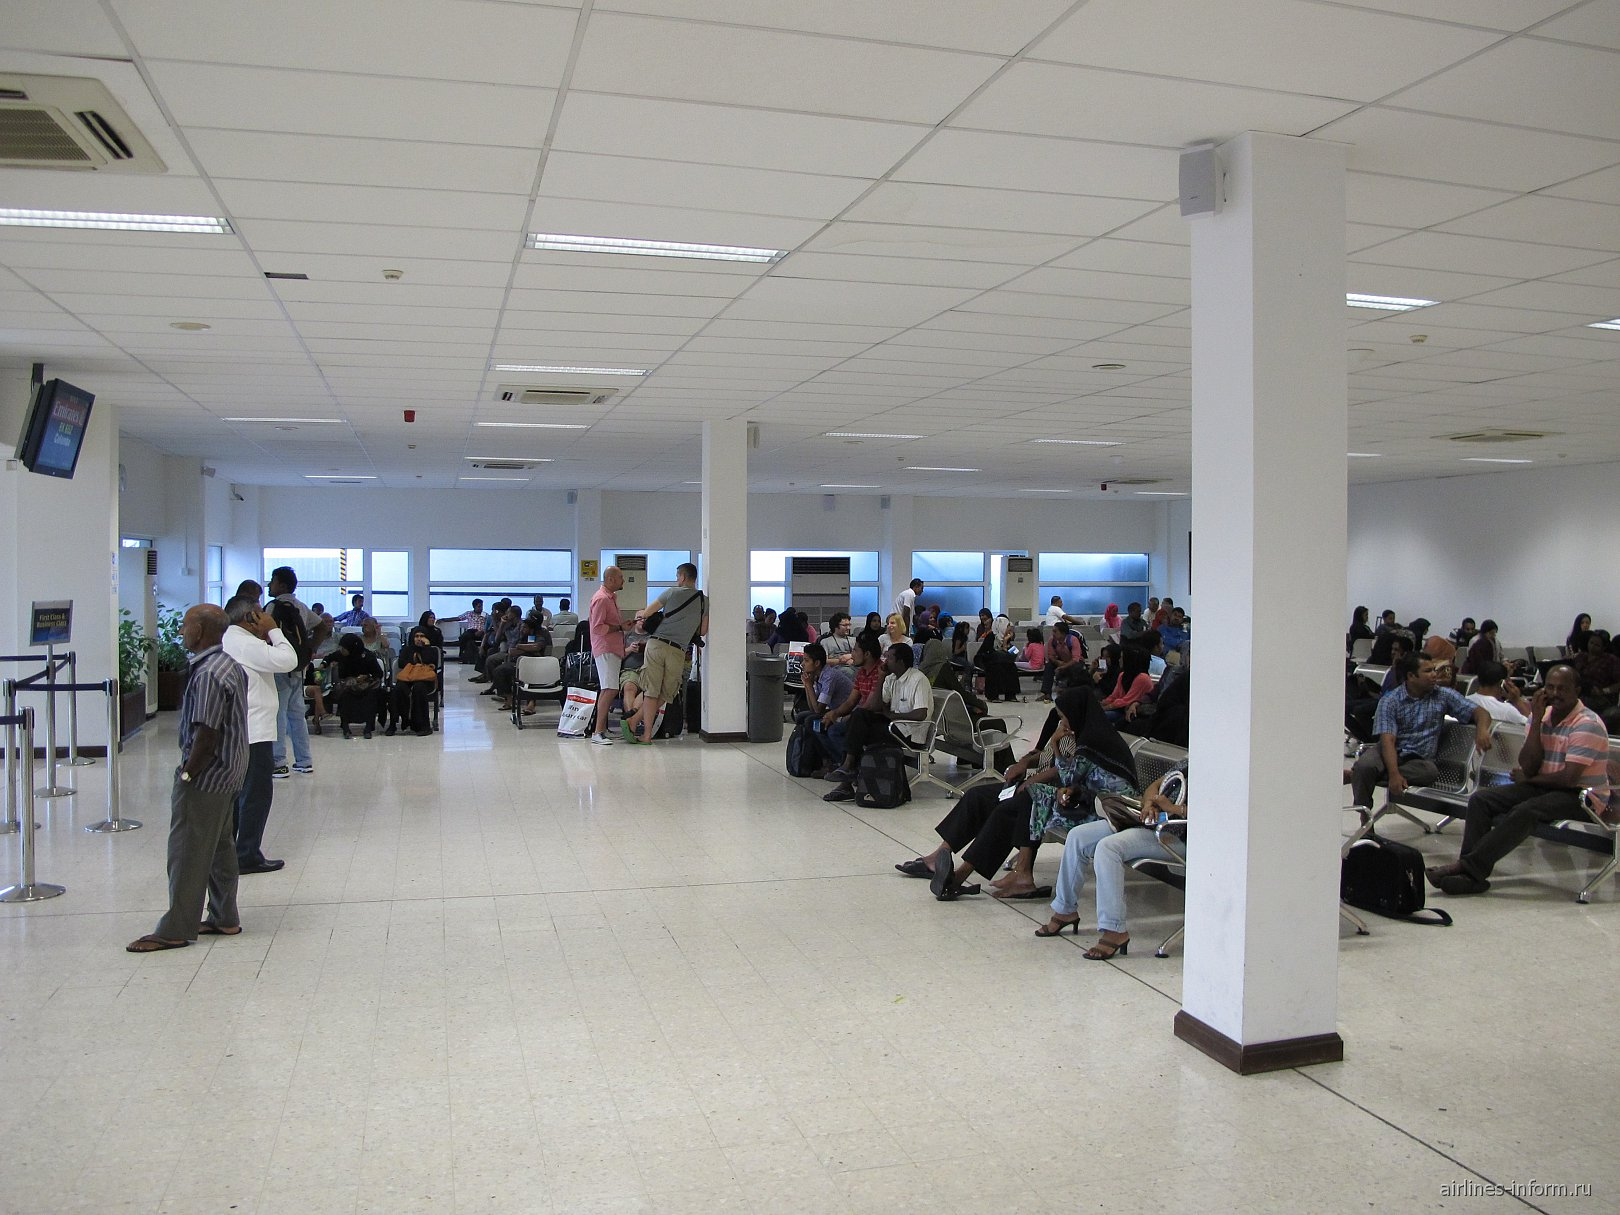 Зал ожидания у выхода на посадку в аэропорту Мале